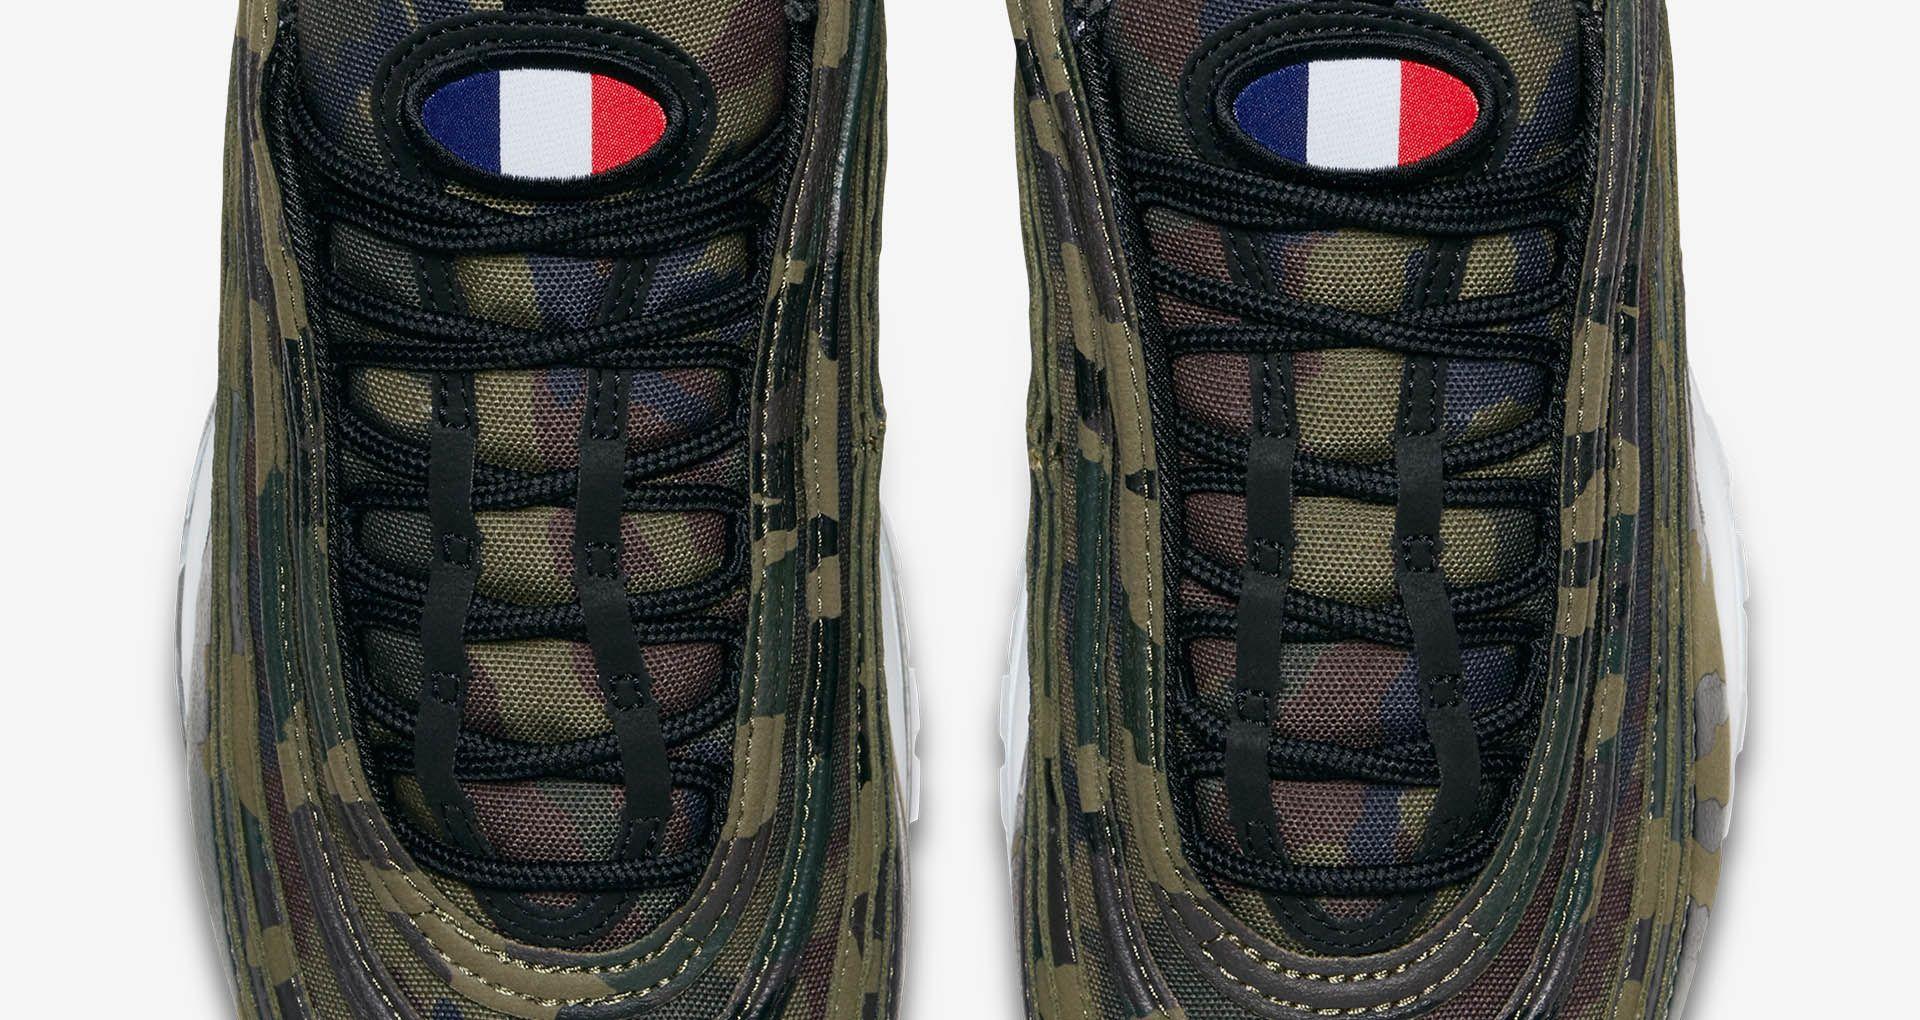 acheter en ligne 5f631 4c6d7 Nike Air Max 97 Premium 'France' Release Date. Nike+ Launch GB